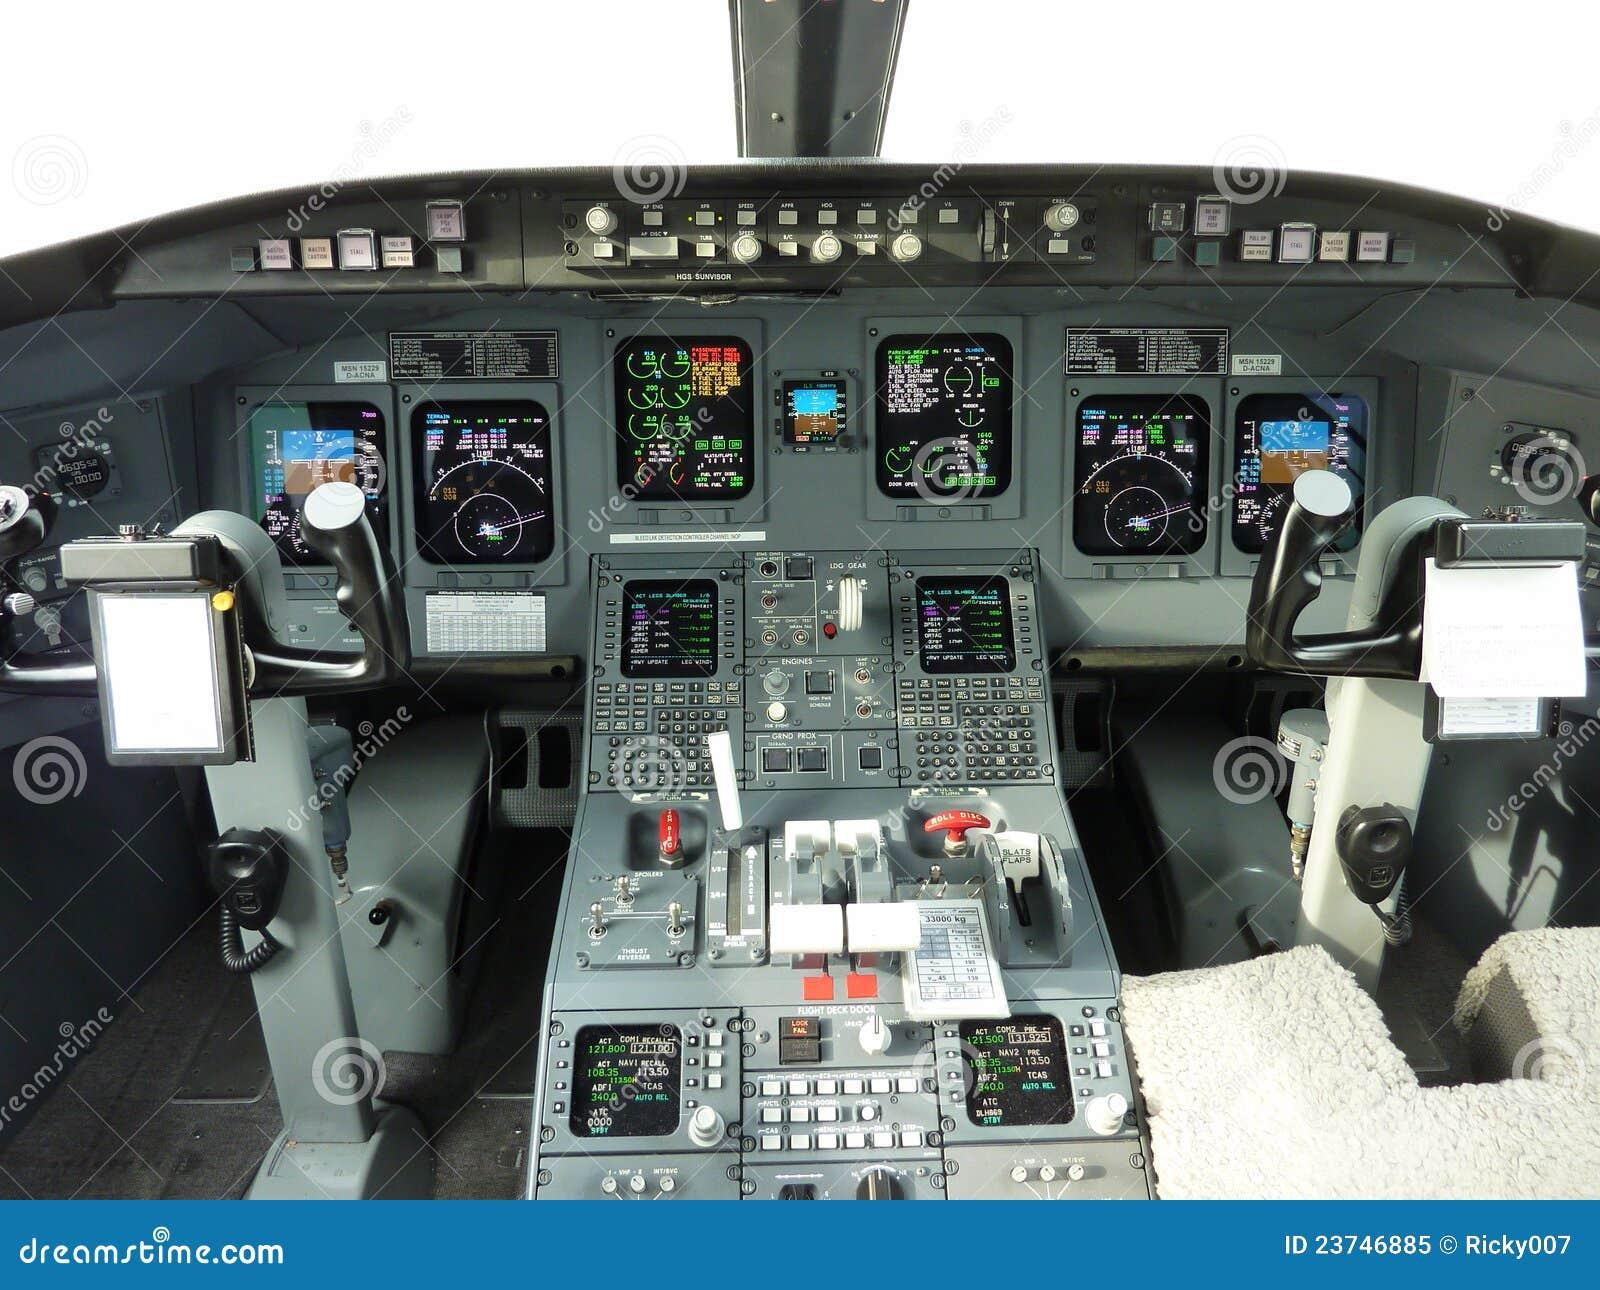 Crj 900 Cockpit Royalty Free Stock Photo Image 23746885